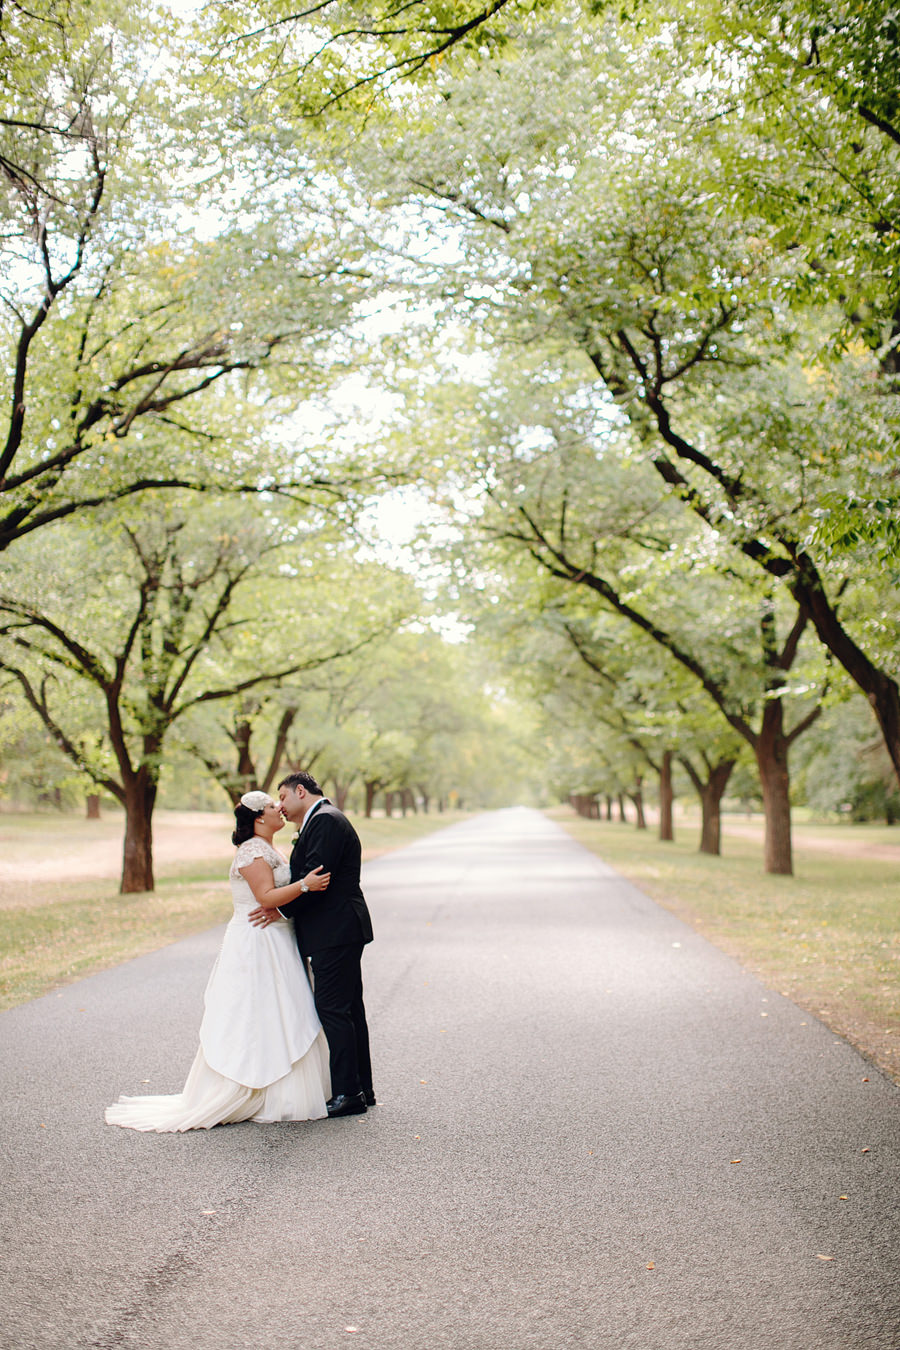 Canberra Wedding Photographer: Bride & Groom portrait